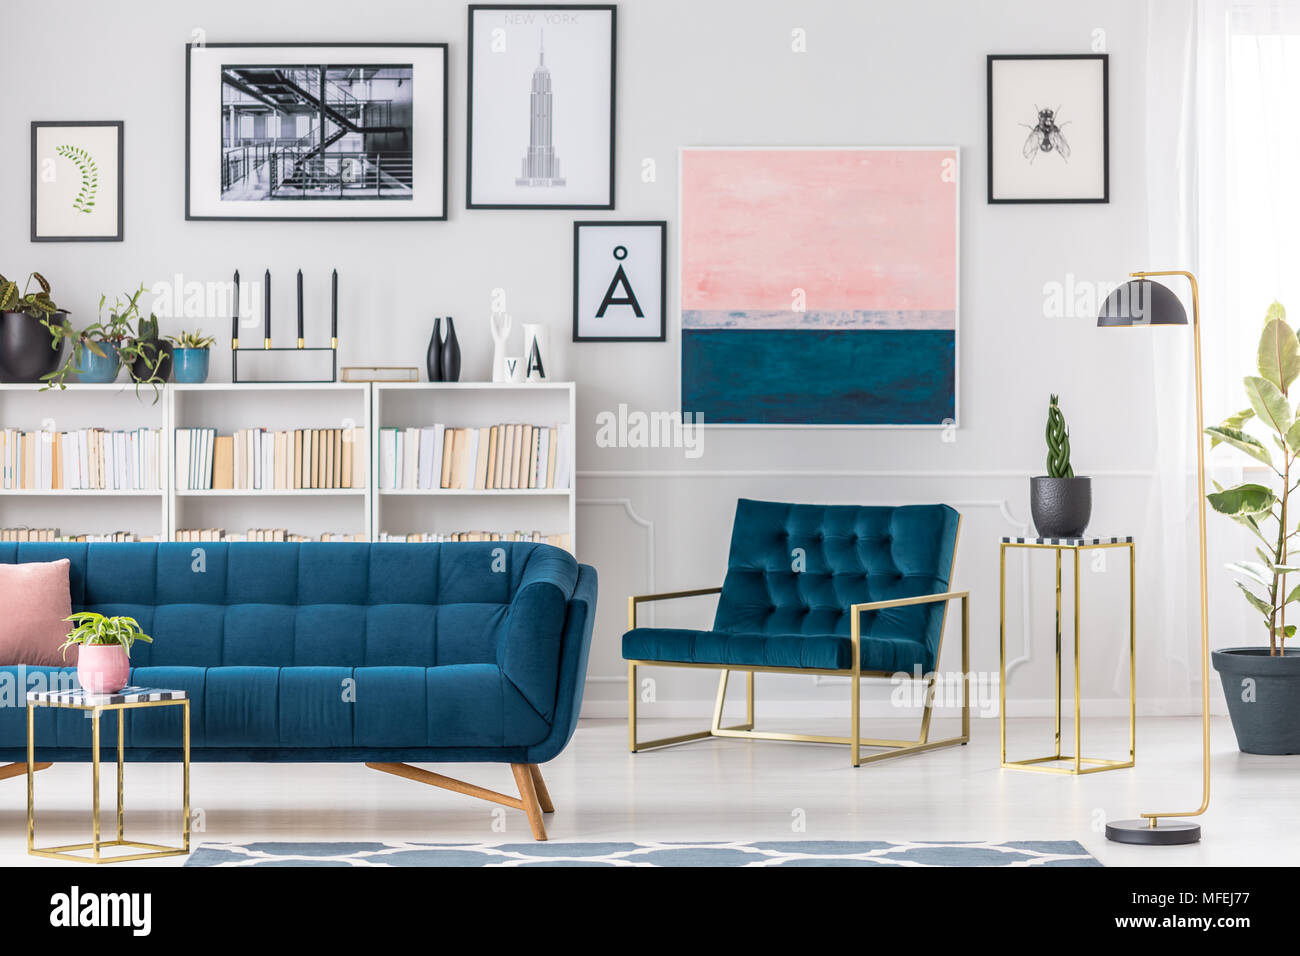 Wunderbar Wohnzimmer Grau Gold Fotos - Heimat Ideen ...